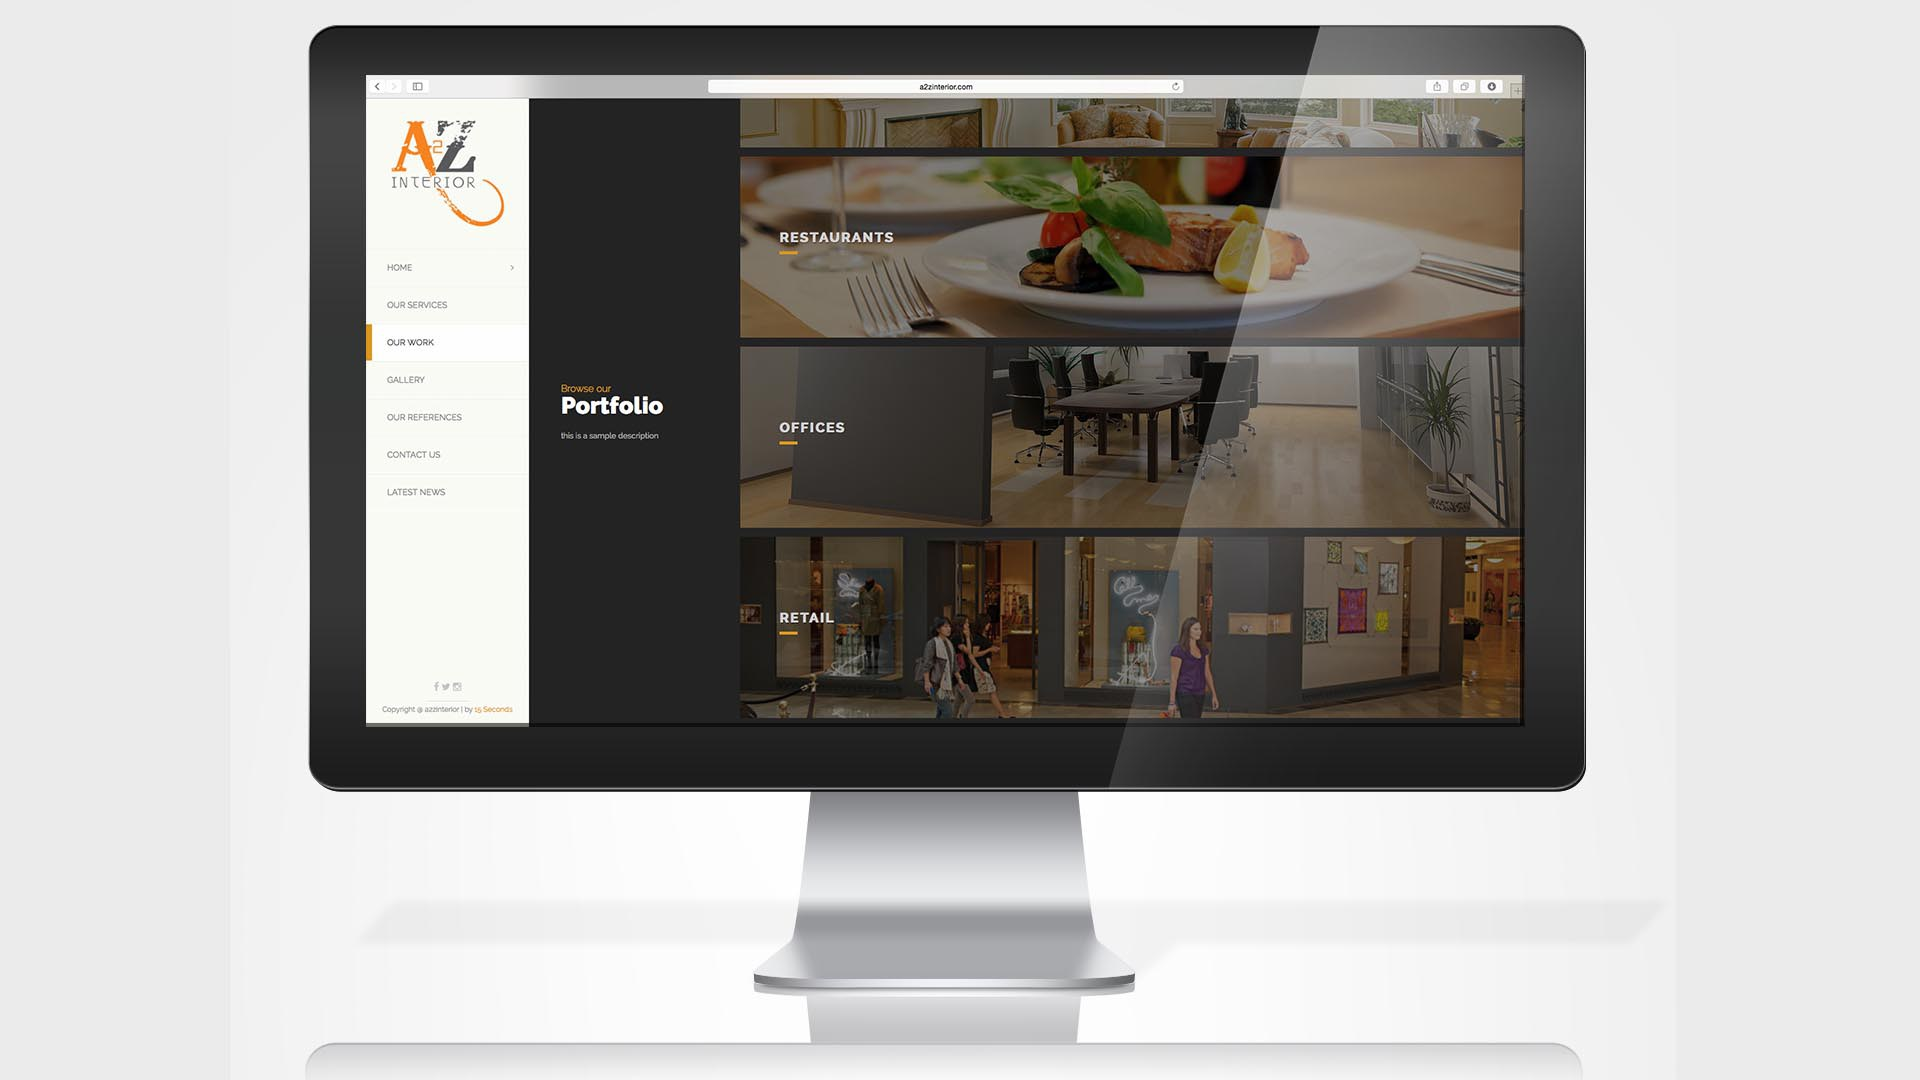 a2z-interiors-website-works